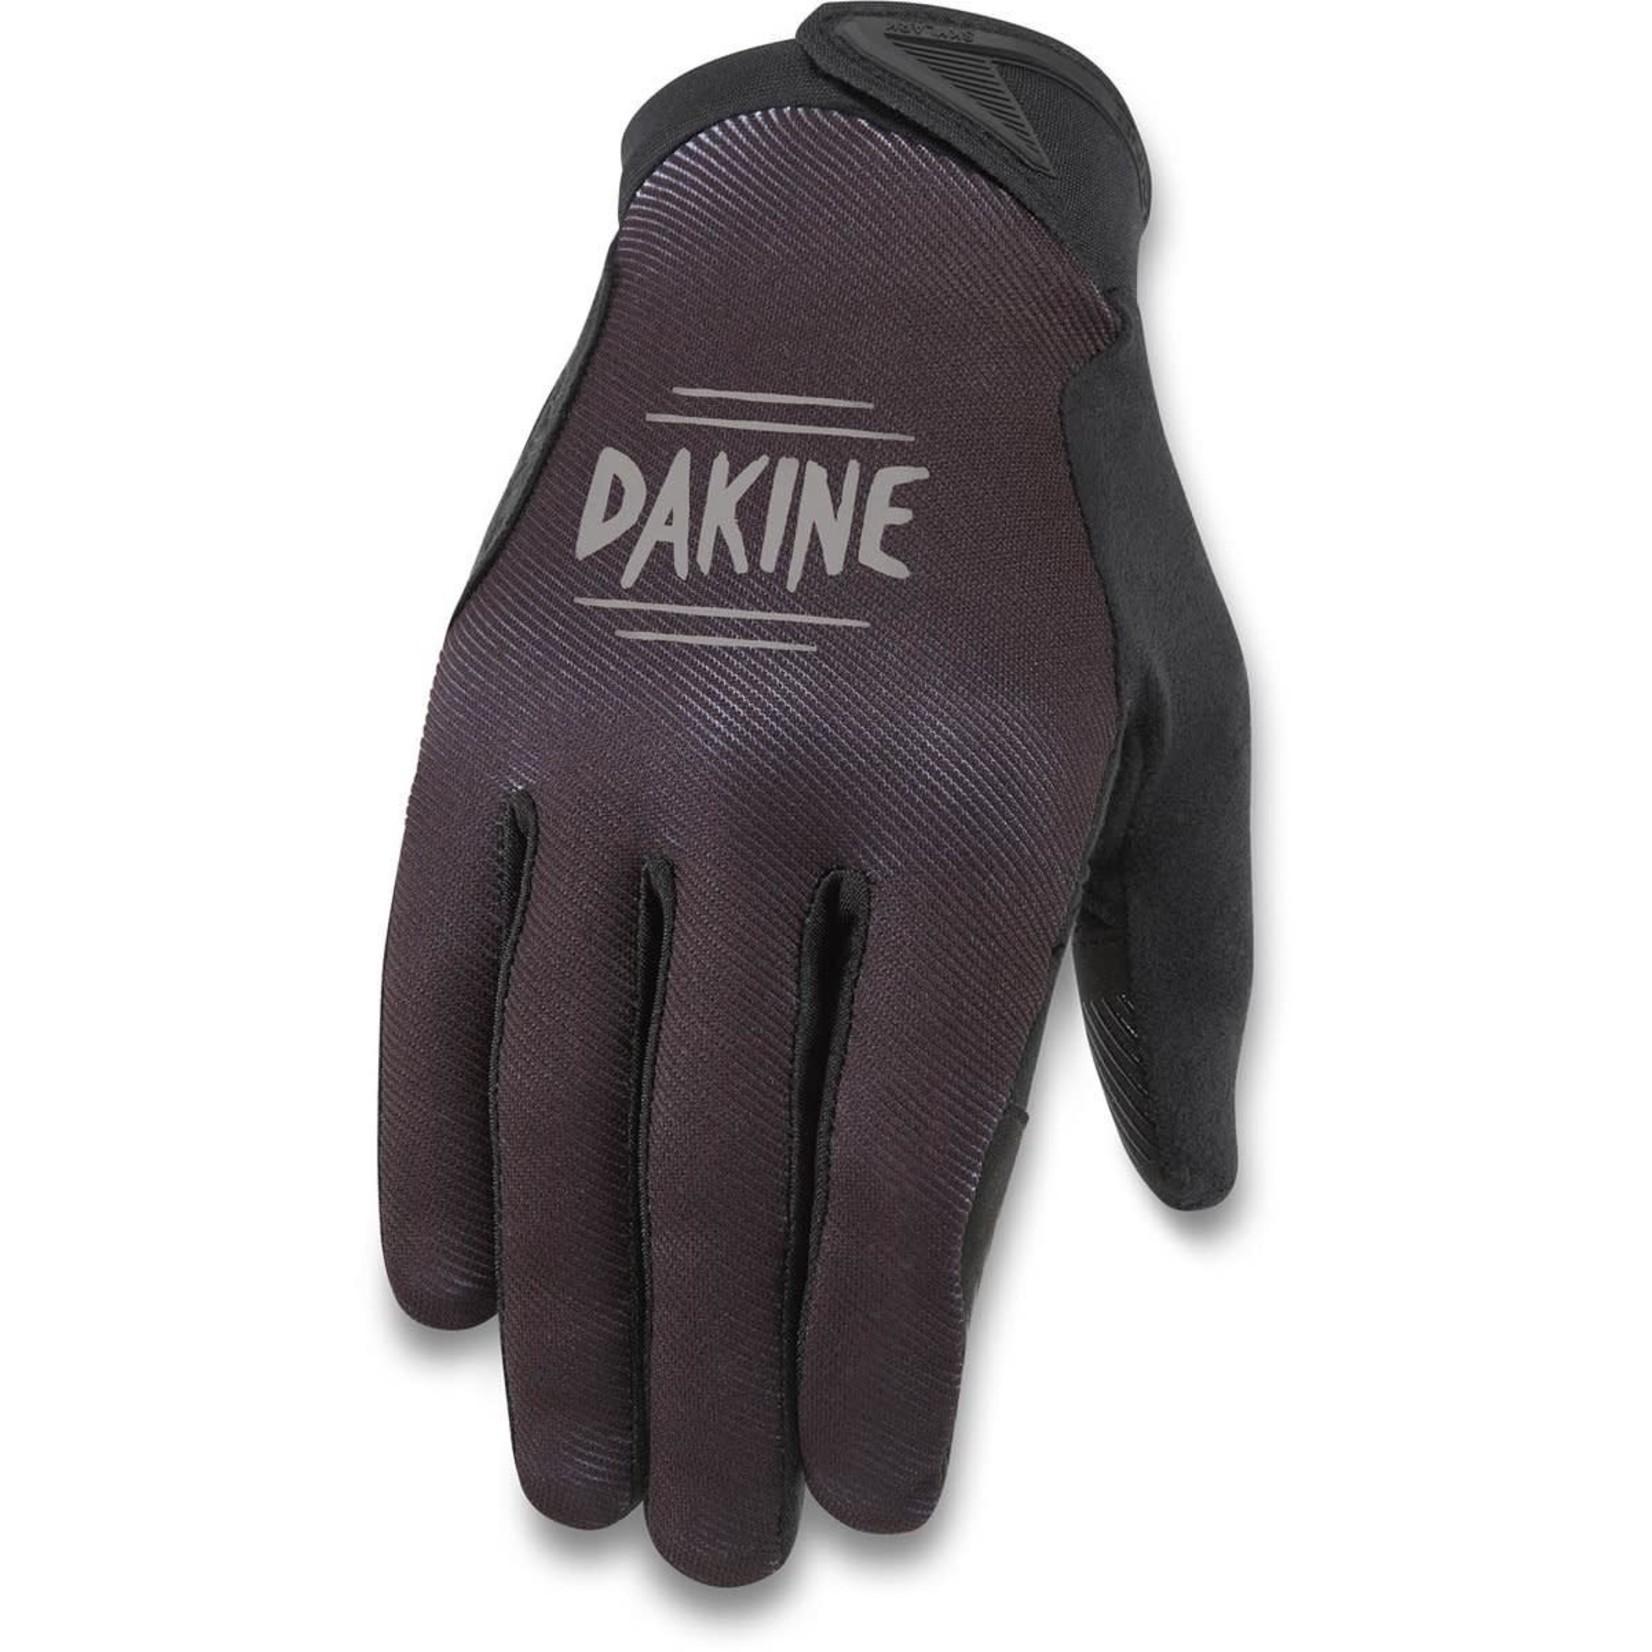 Dakine Dakine Glove Syncline large